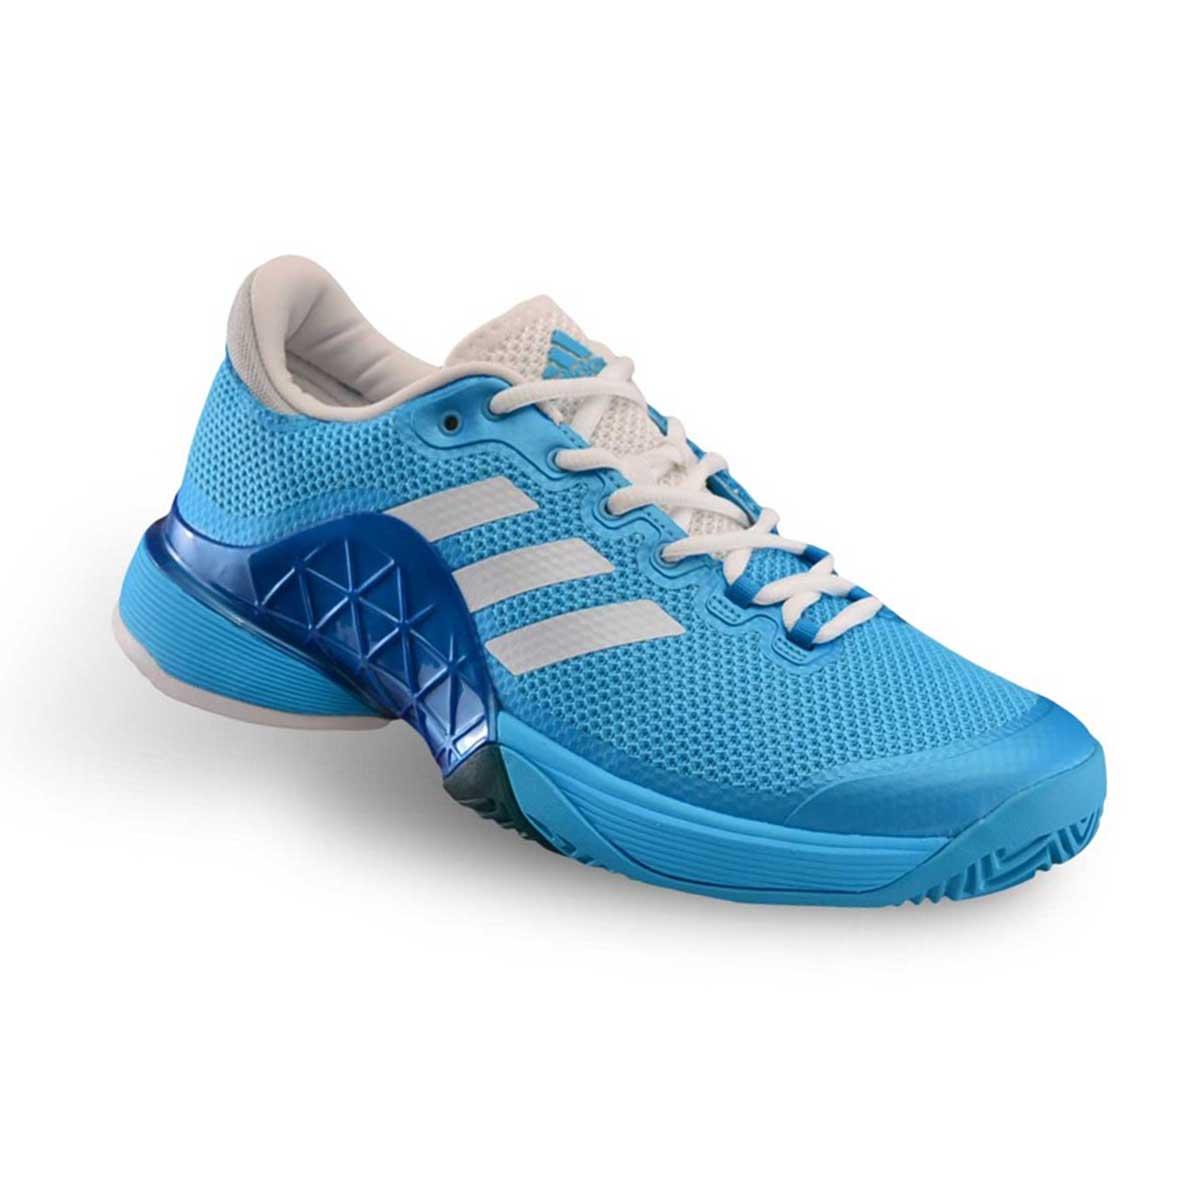 Adidas 2017 Shoesbluewhite Adidas Tennis Barricade tshdBCxQr